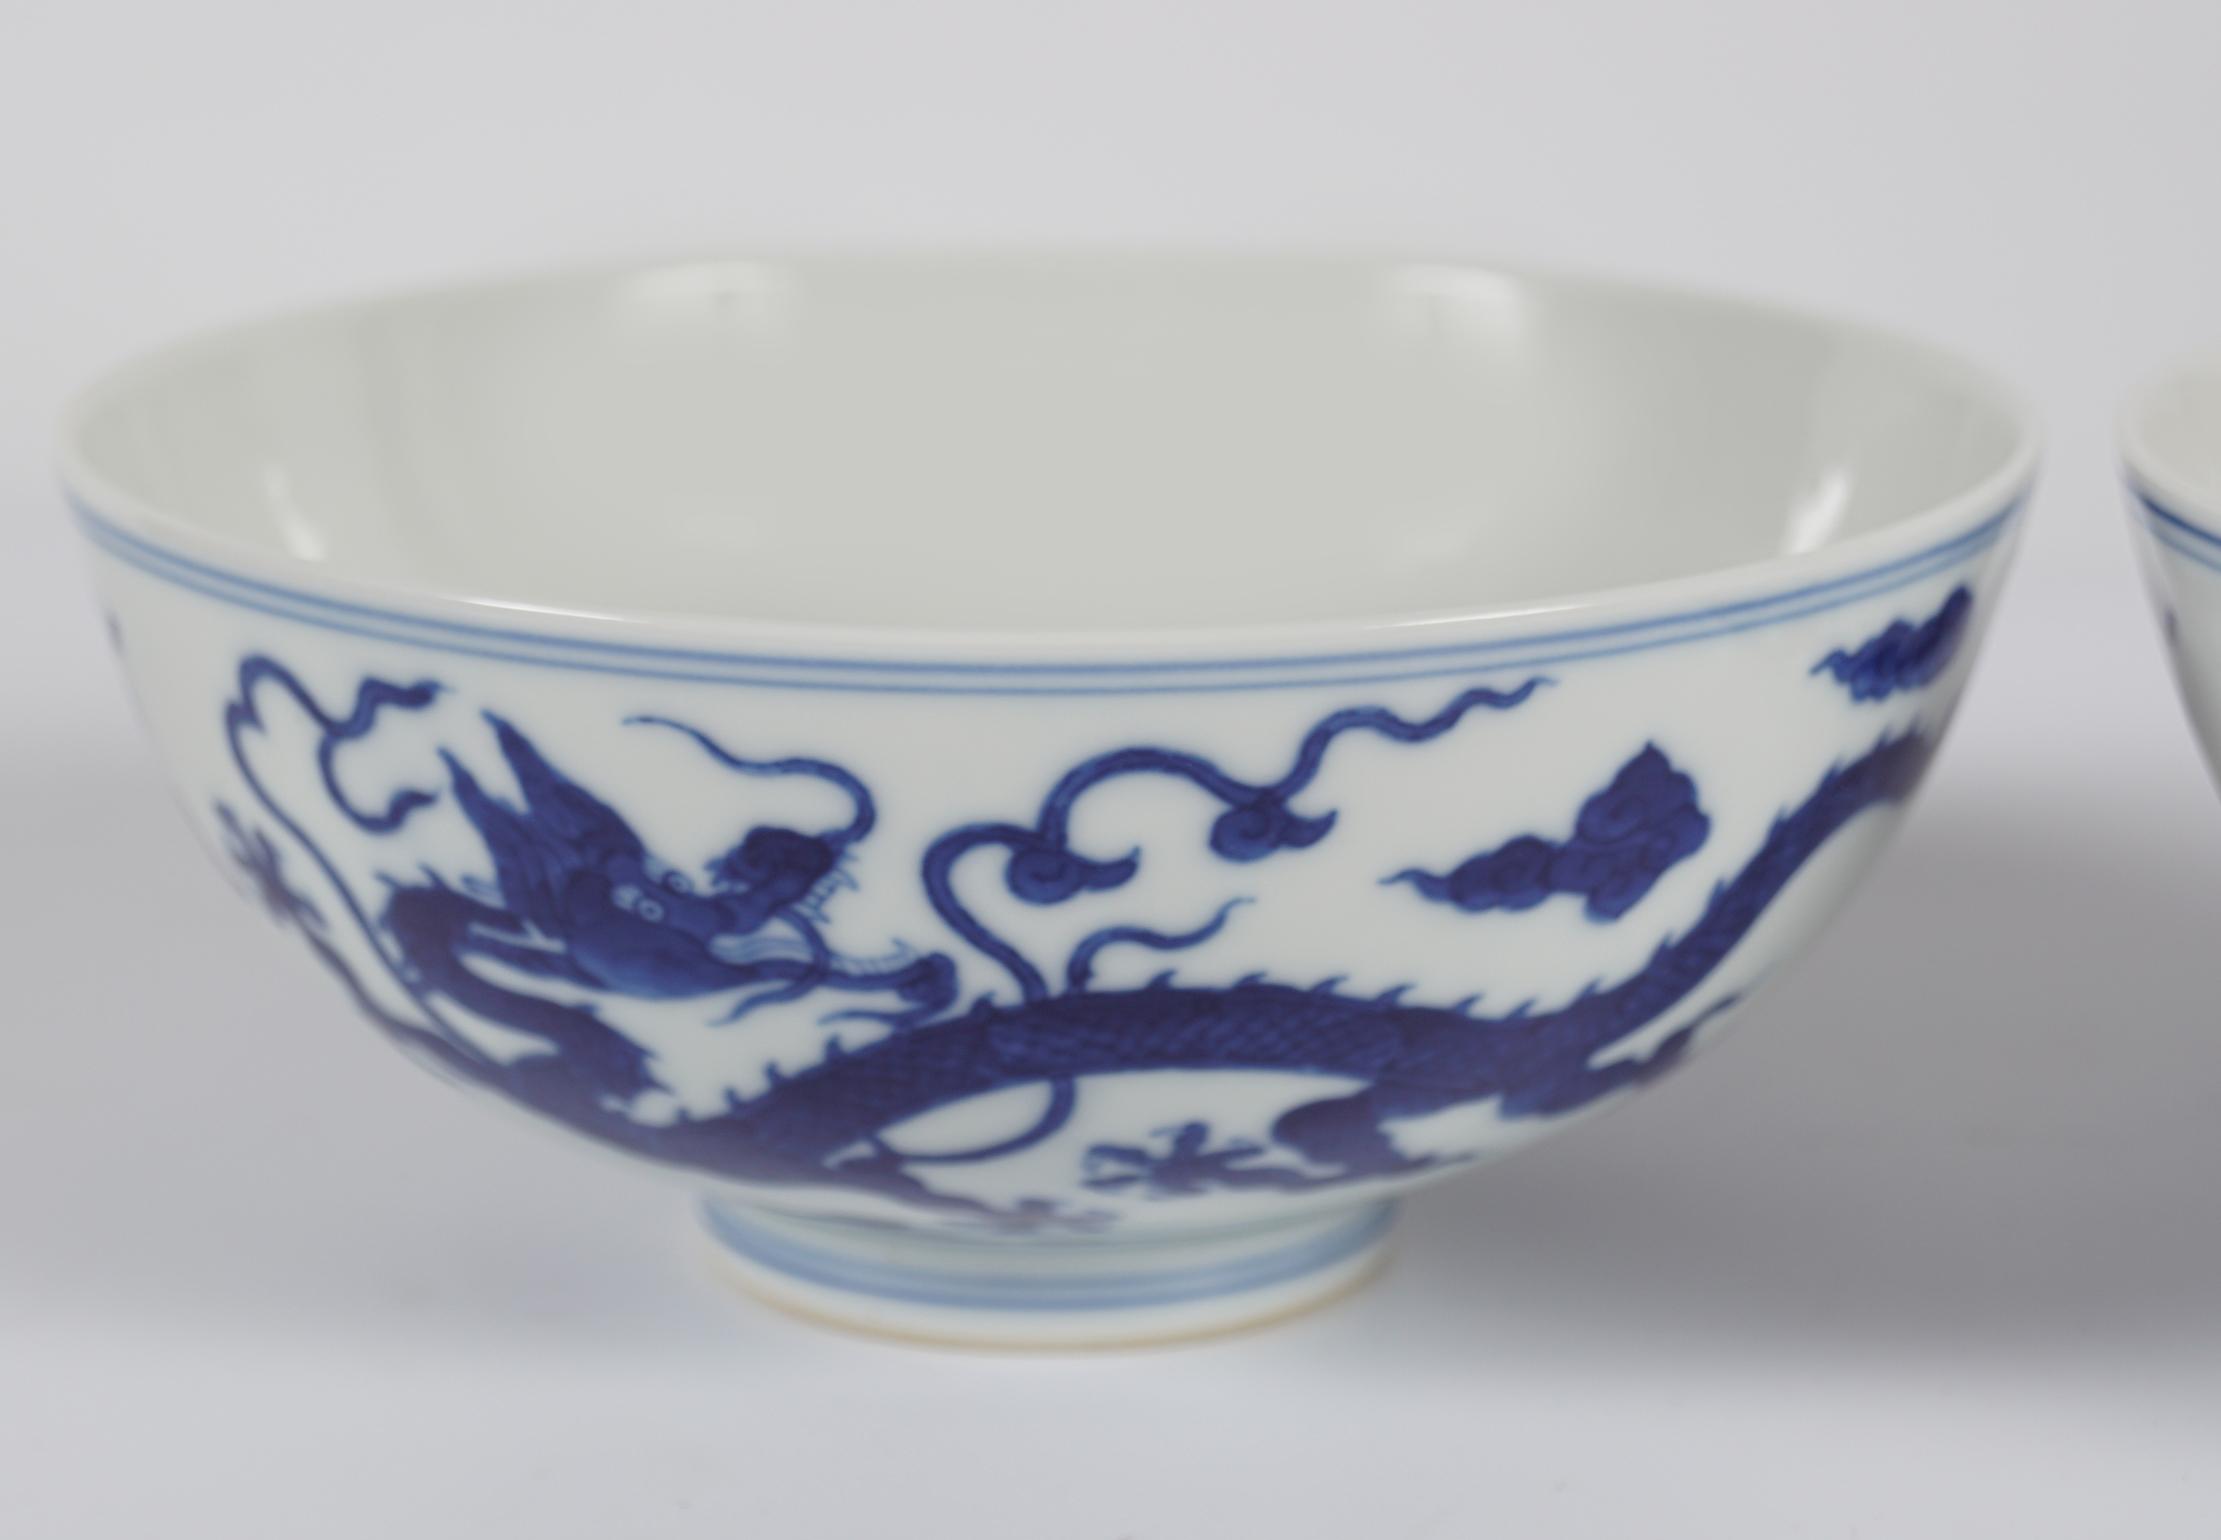 PAIR OF CHINESE DRAGON BOWLS - Image 2 of 6